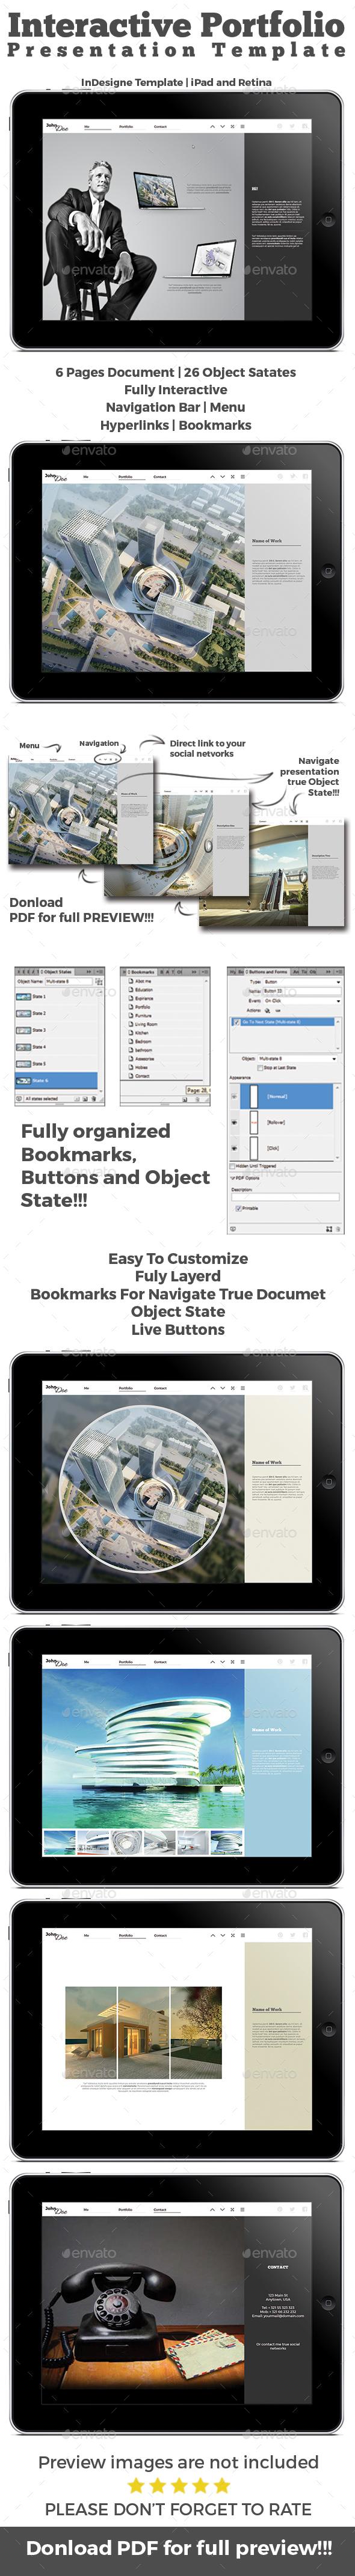 Interactive PDF Prezentation iPad and Retina - Digital Magazines ePublishing